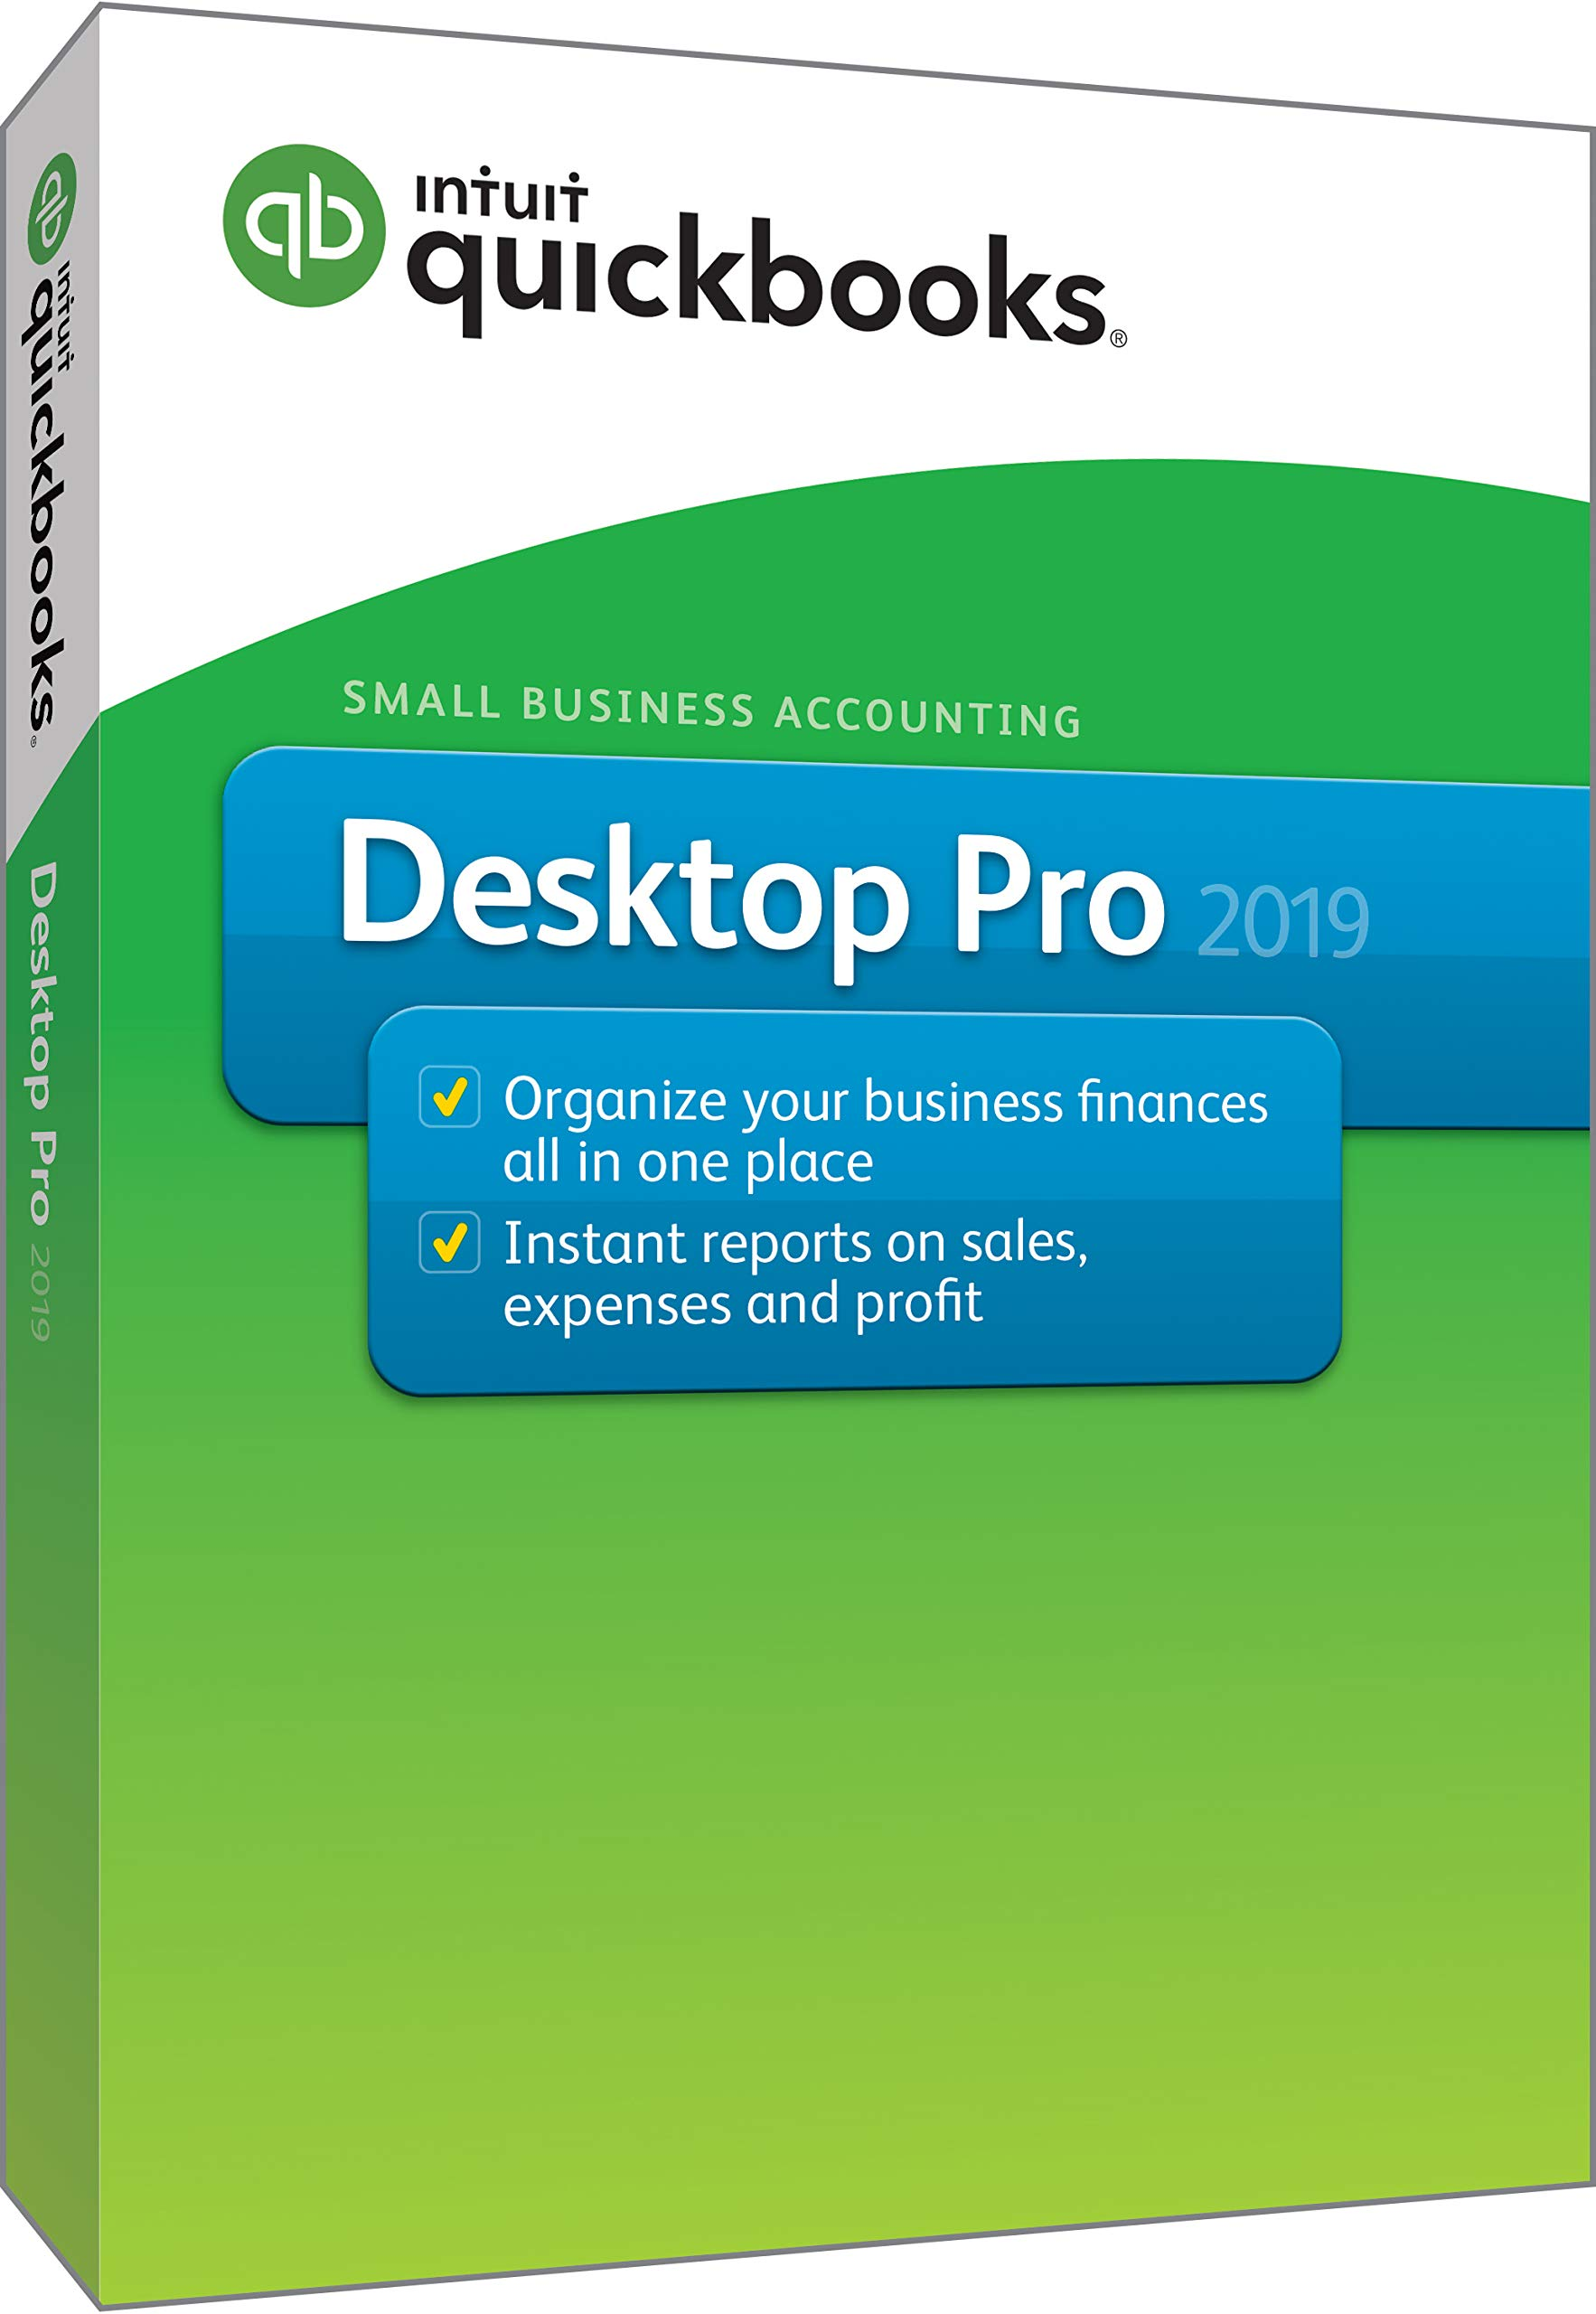 Intuit QuickBooks Desktop Pro 2019 [PC Disc][Old Version] by Intuit